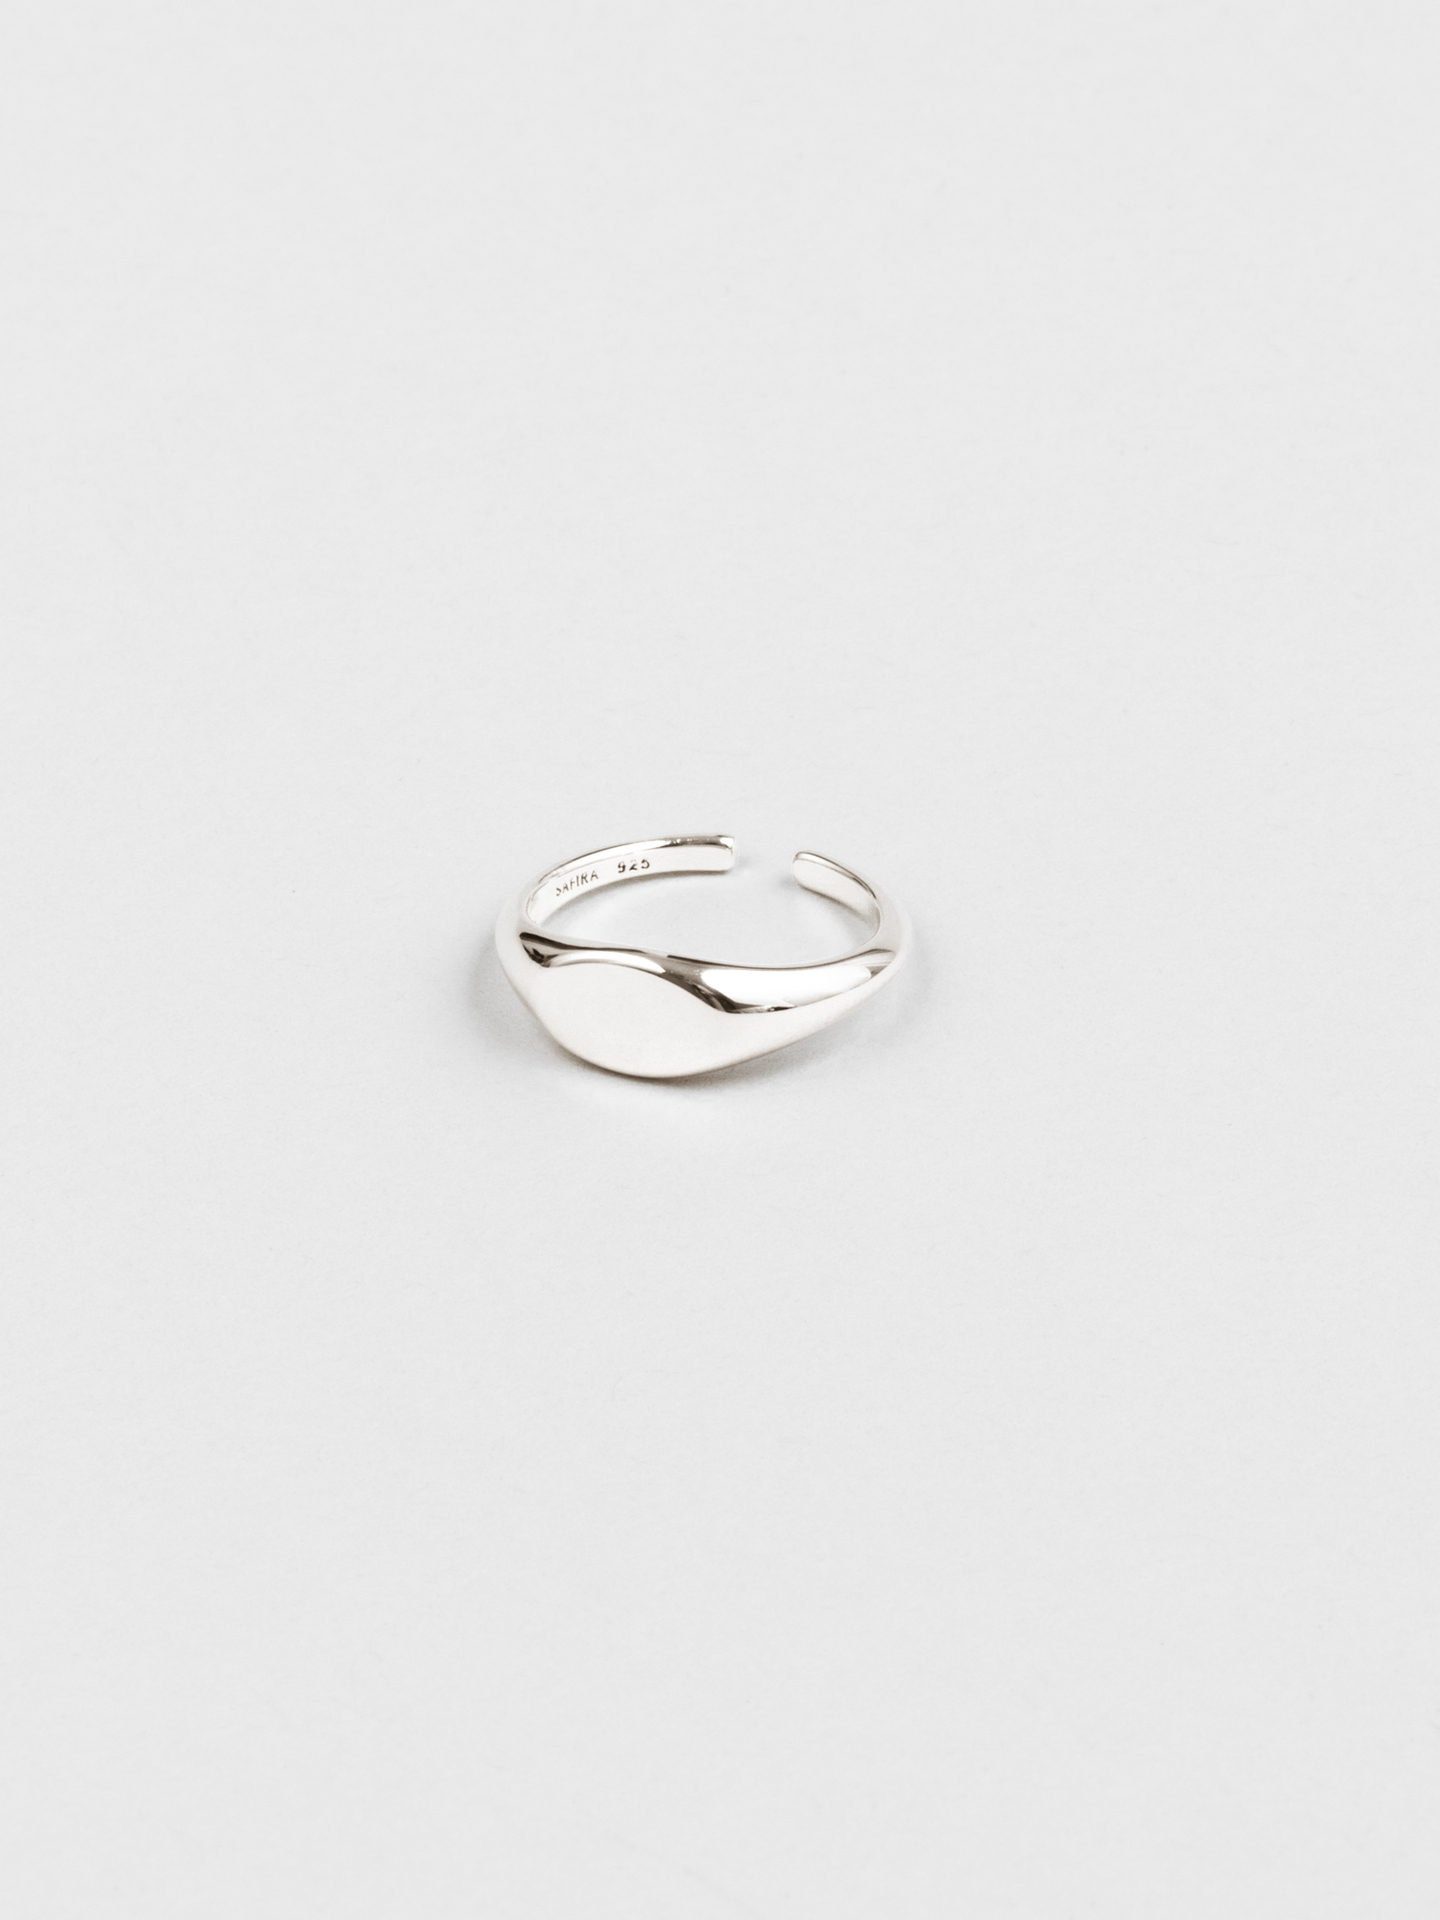 Best Friend Ring